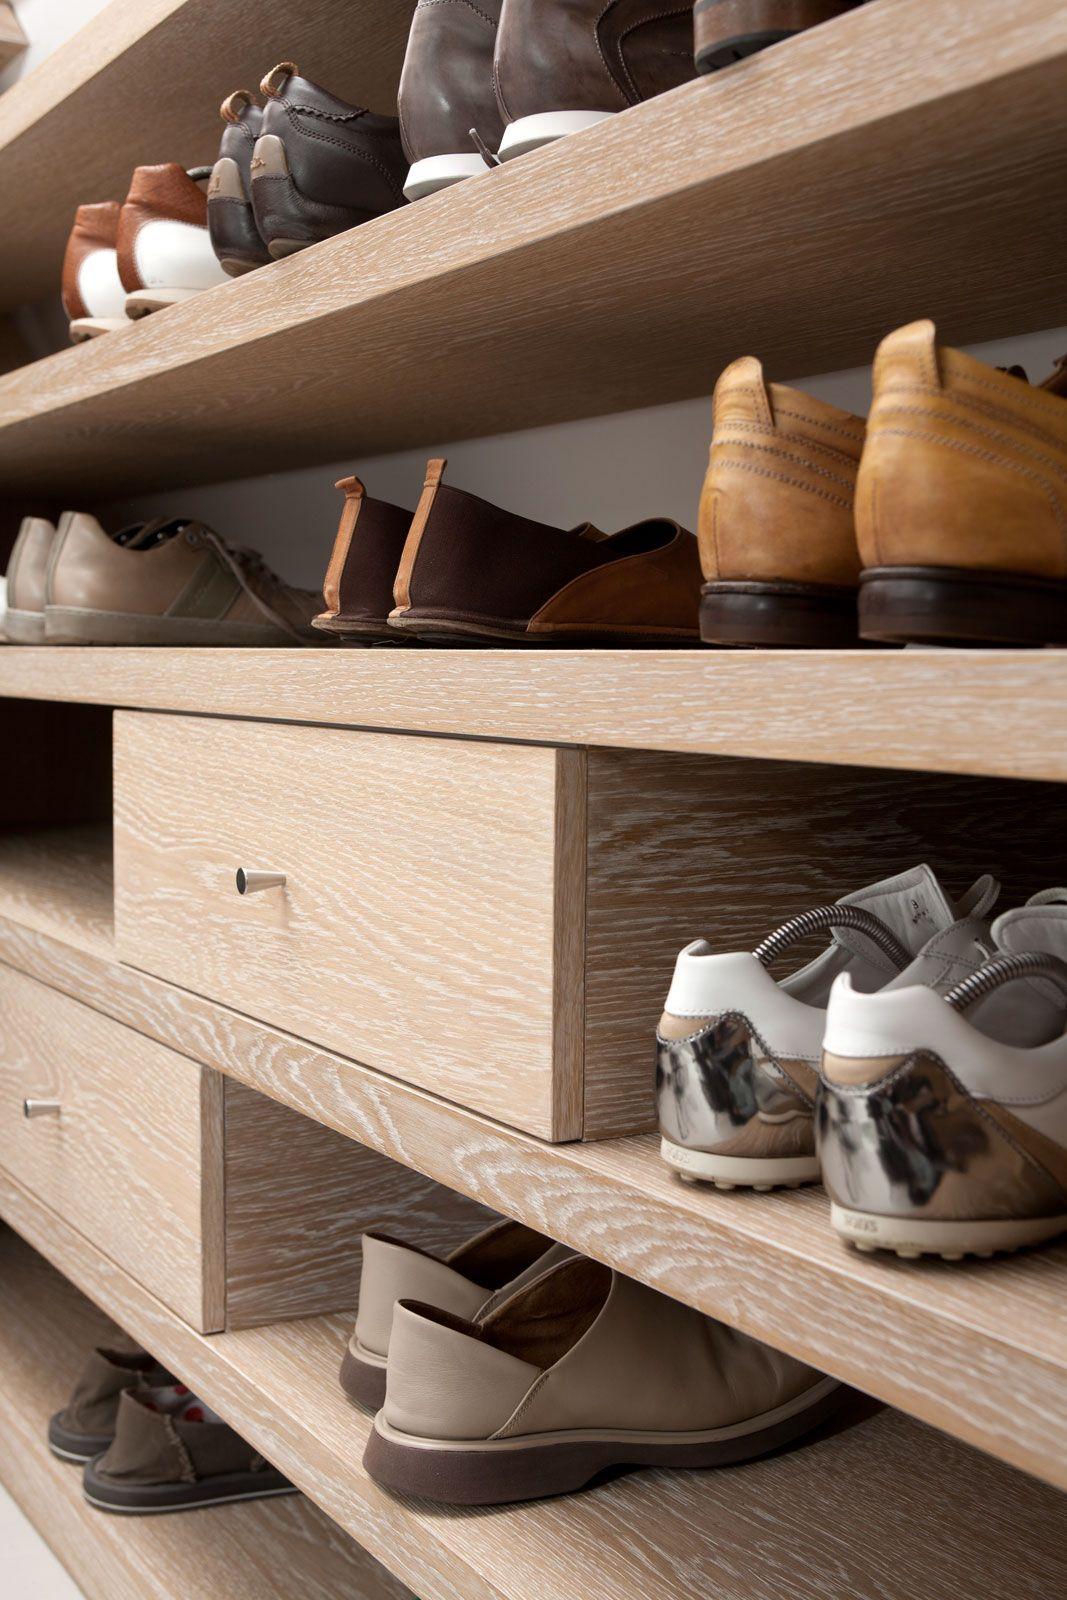 remy meijers interieurarchitectuur design mobilier pinterest dressing rangement penderie. Black Bedroom Furniture Sets. Home Design Ideas